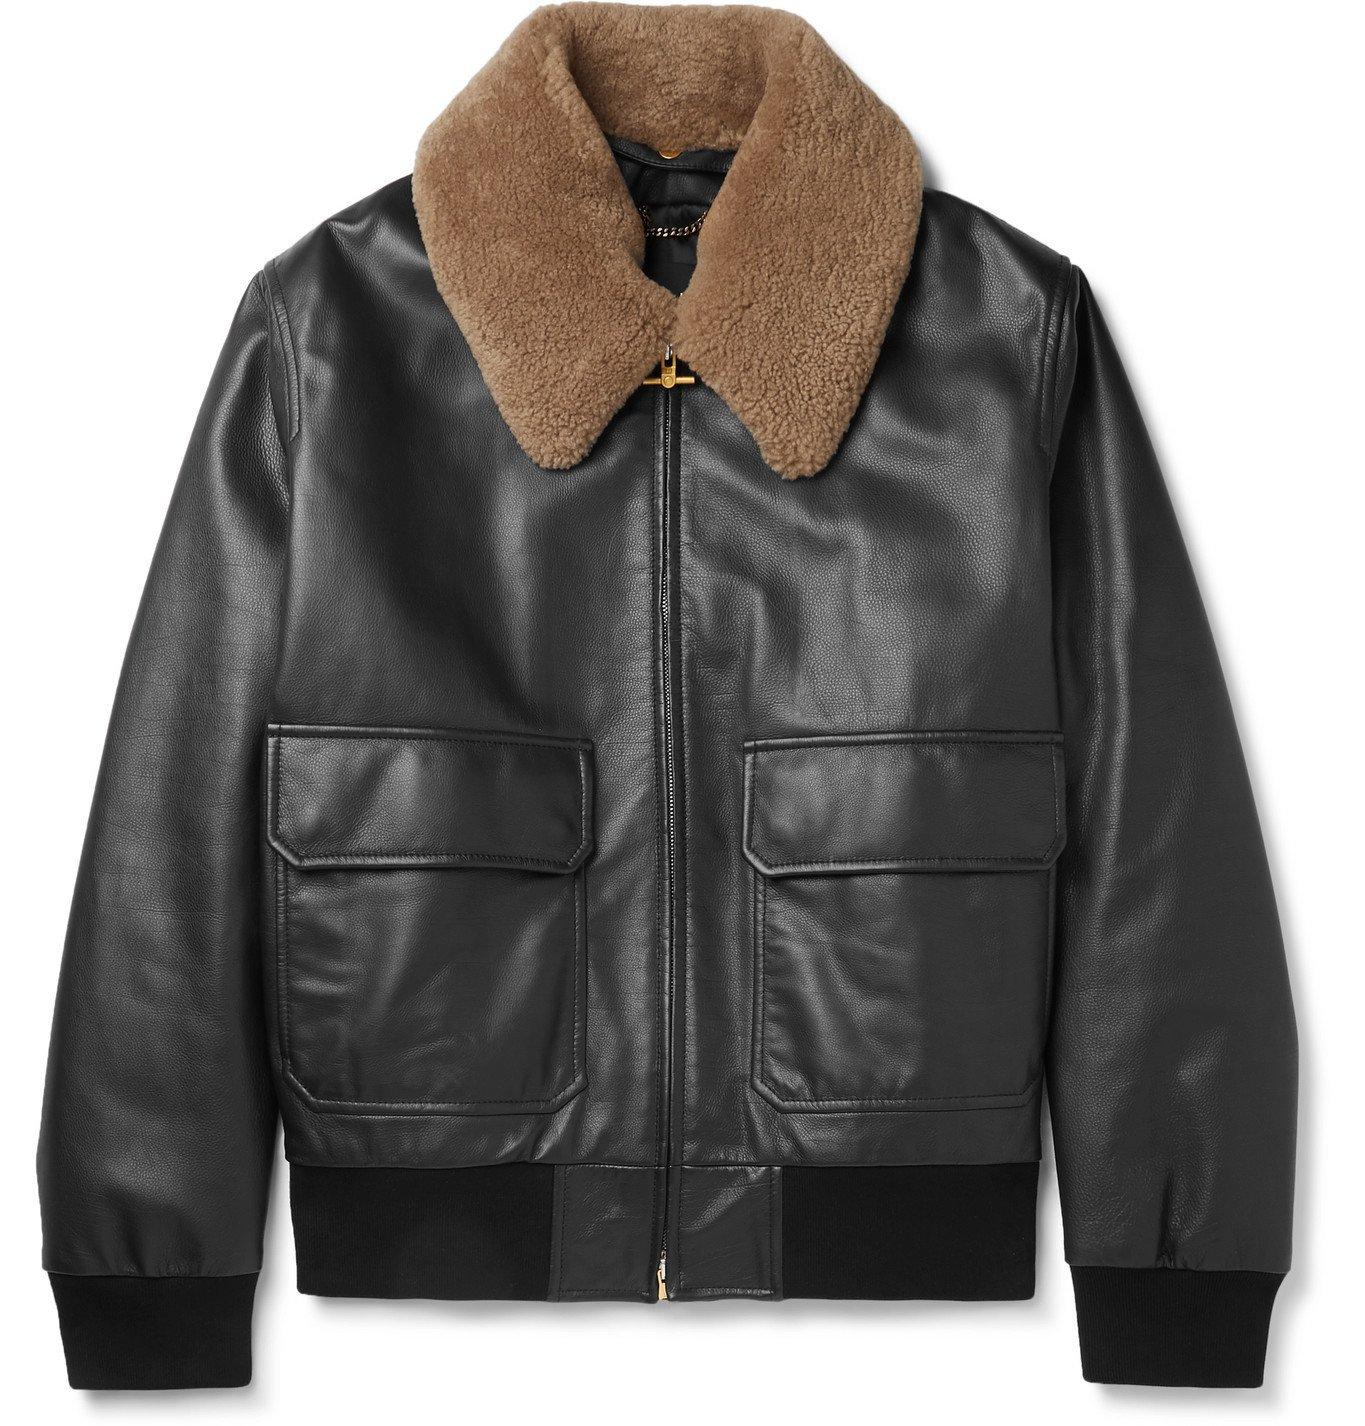 Dunhill - Shearling-Trimmed Leather Bomber Jacket - Black